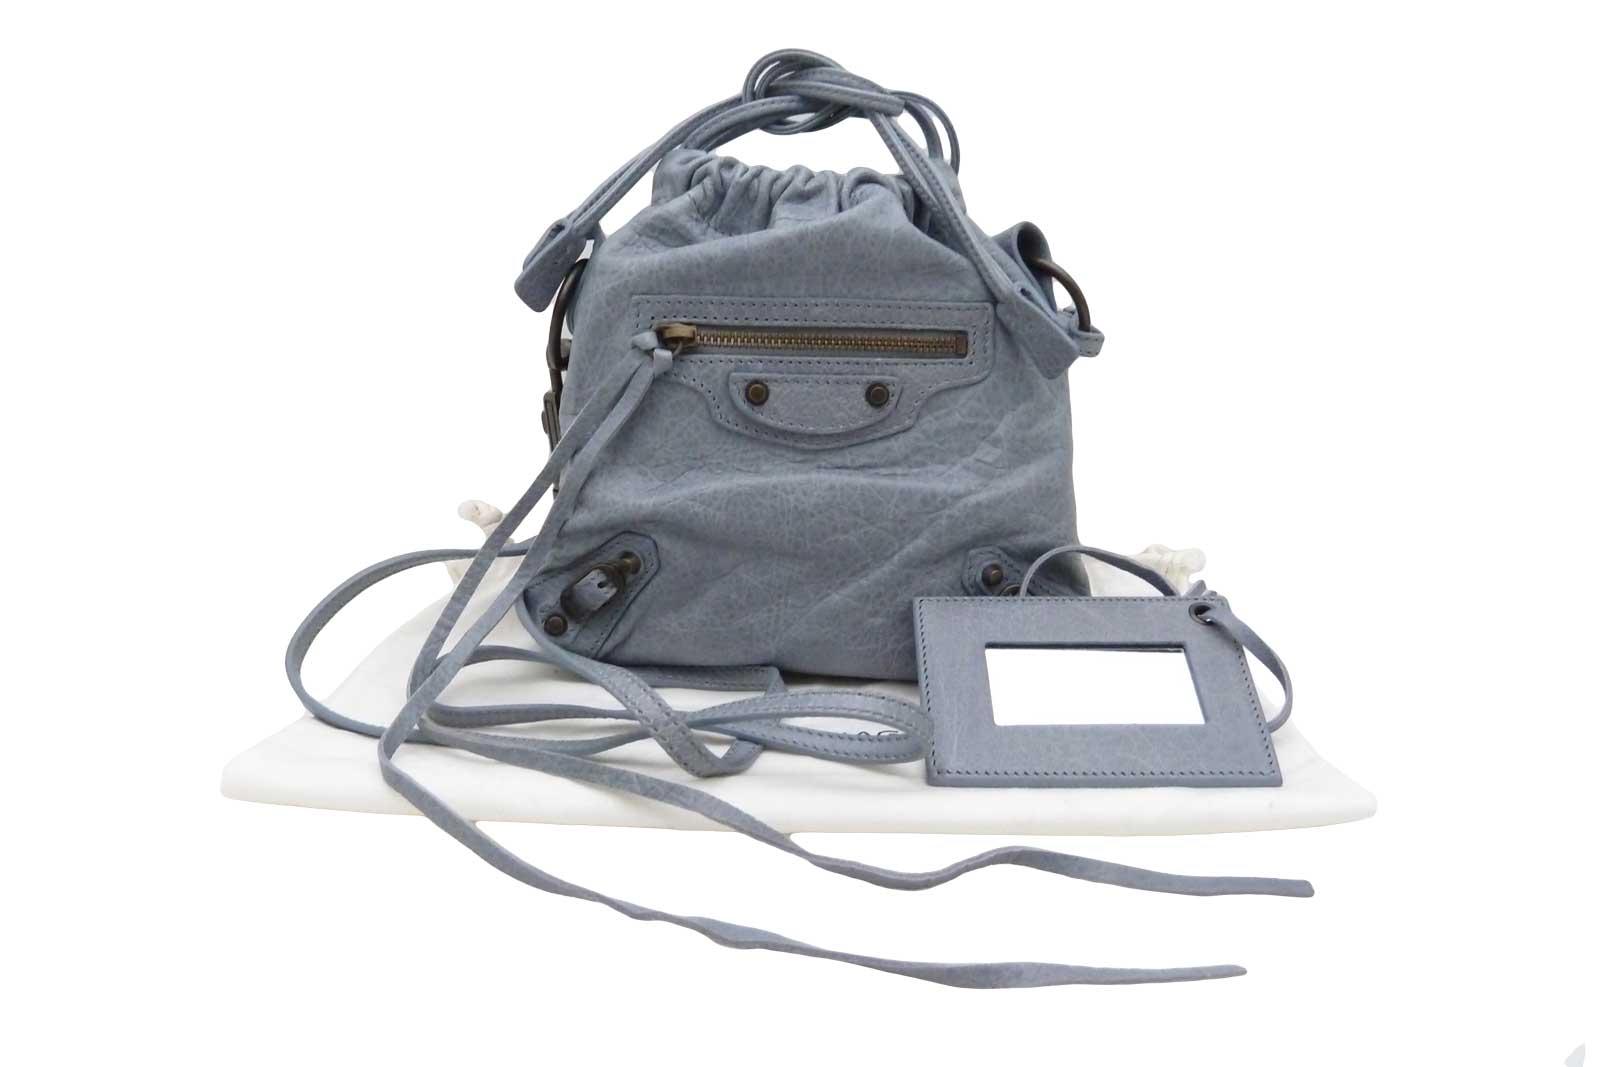 de68b85a36 Auth BALENCIAGA Small Drawstring Crossbody Shoulder Bag Blue Gray ...